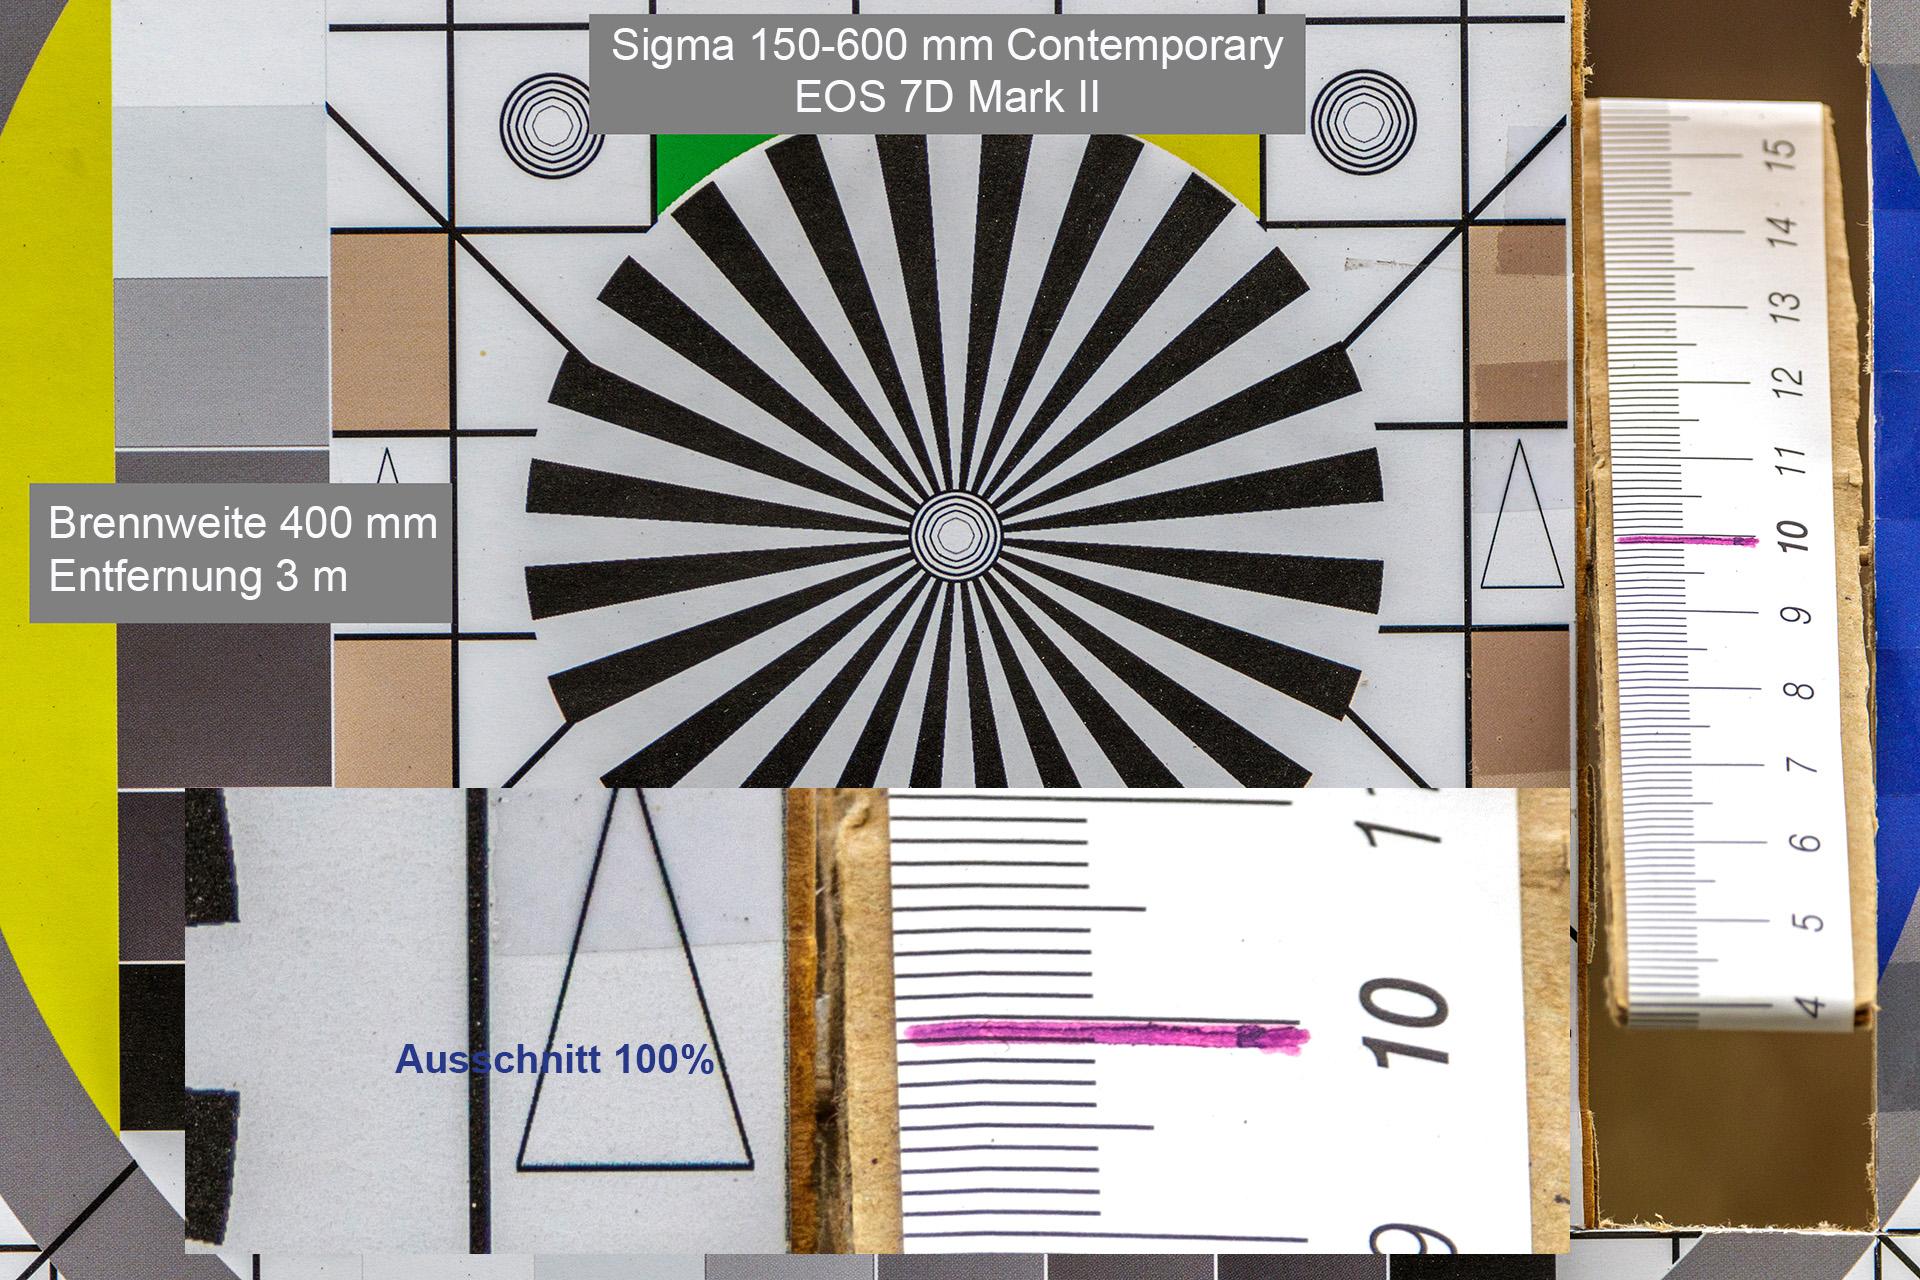 Testaufnahmen, Sigma 150-600 mm, 7D Mark II, 3 Meter, 400 mm